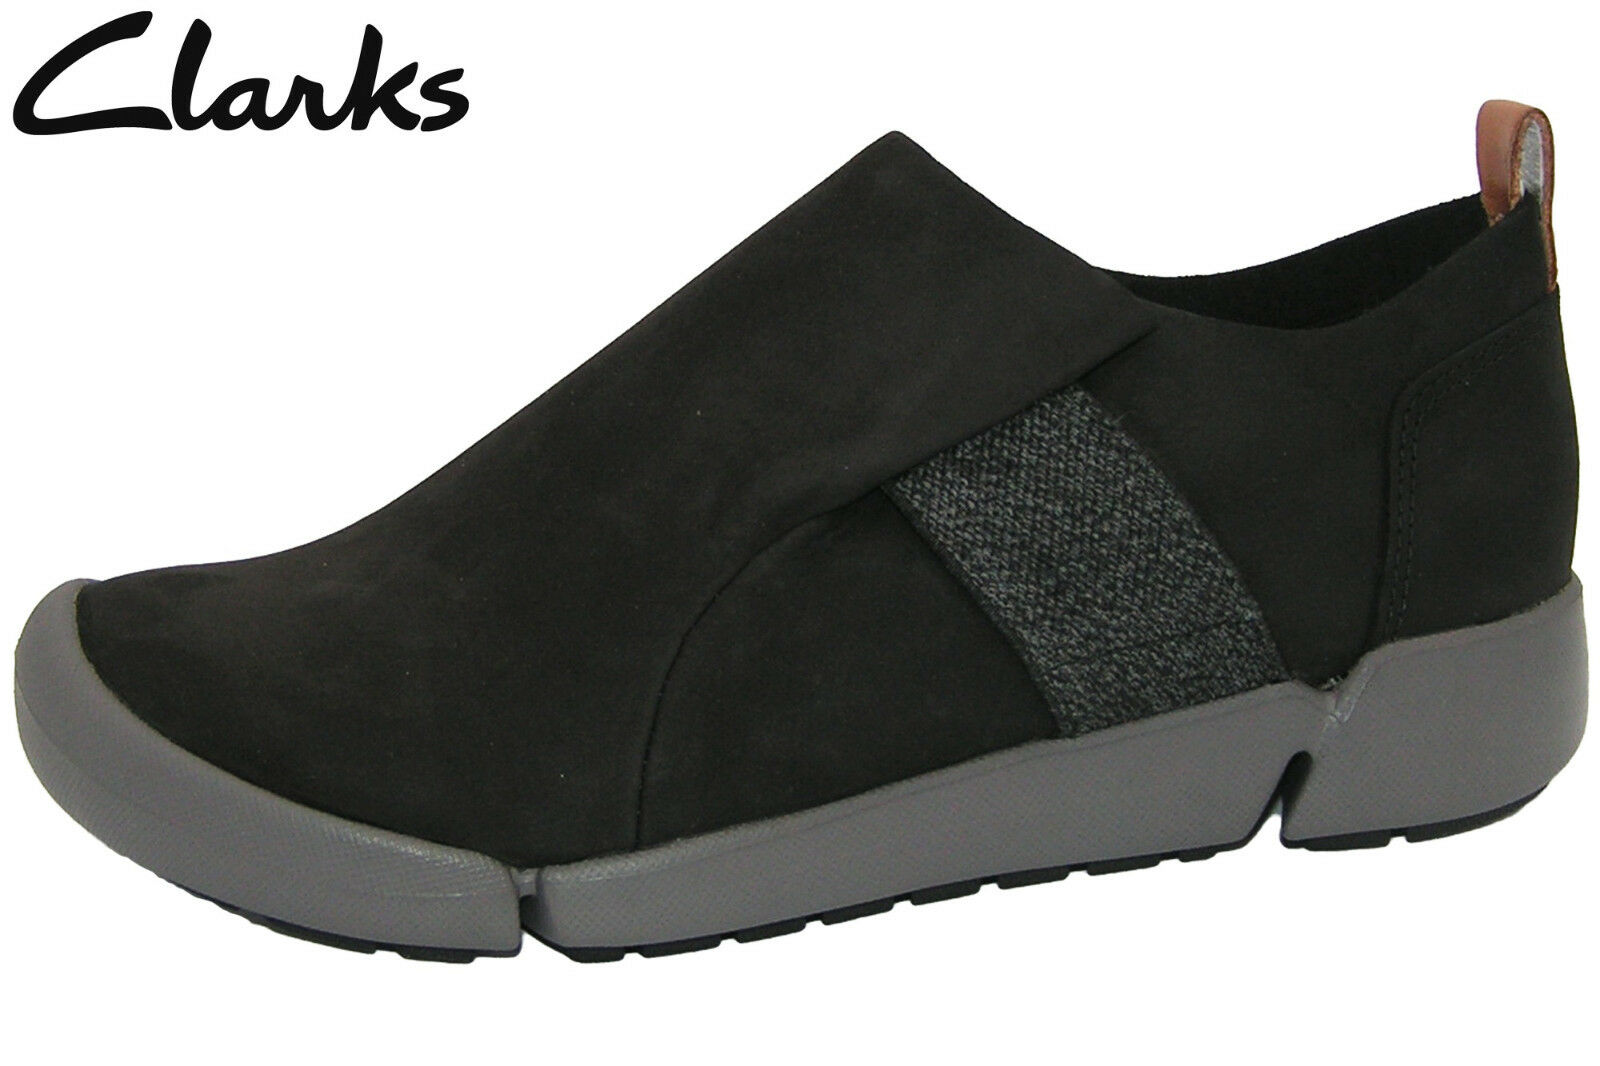 Clarks Tri Lily Damen Halbschuh Schwarz Nubuk Leder Slip-on Schuhe 26127231 NEU